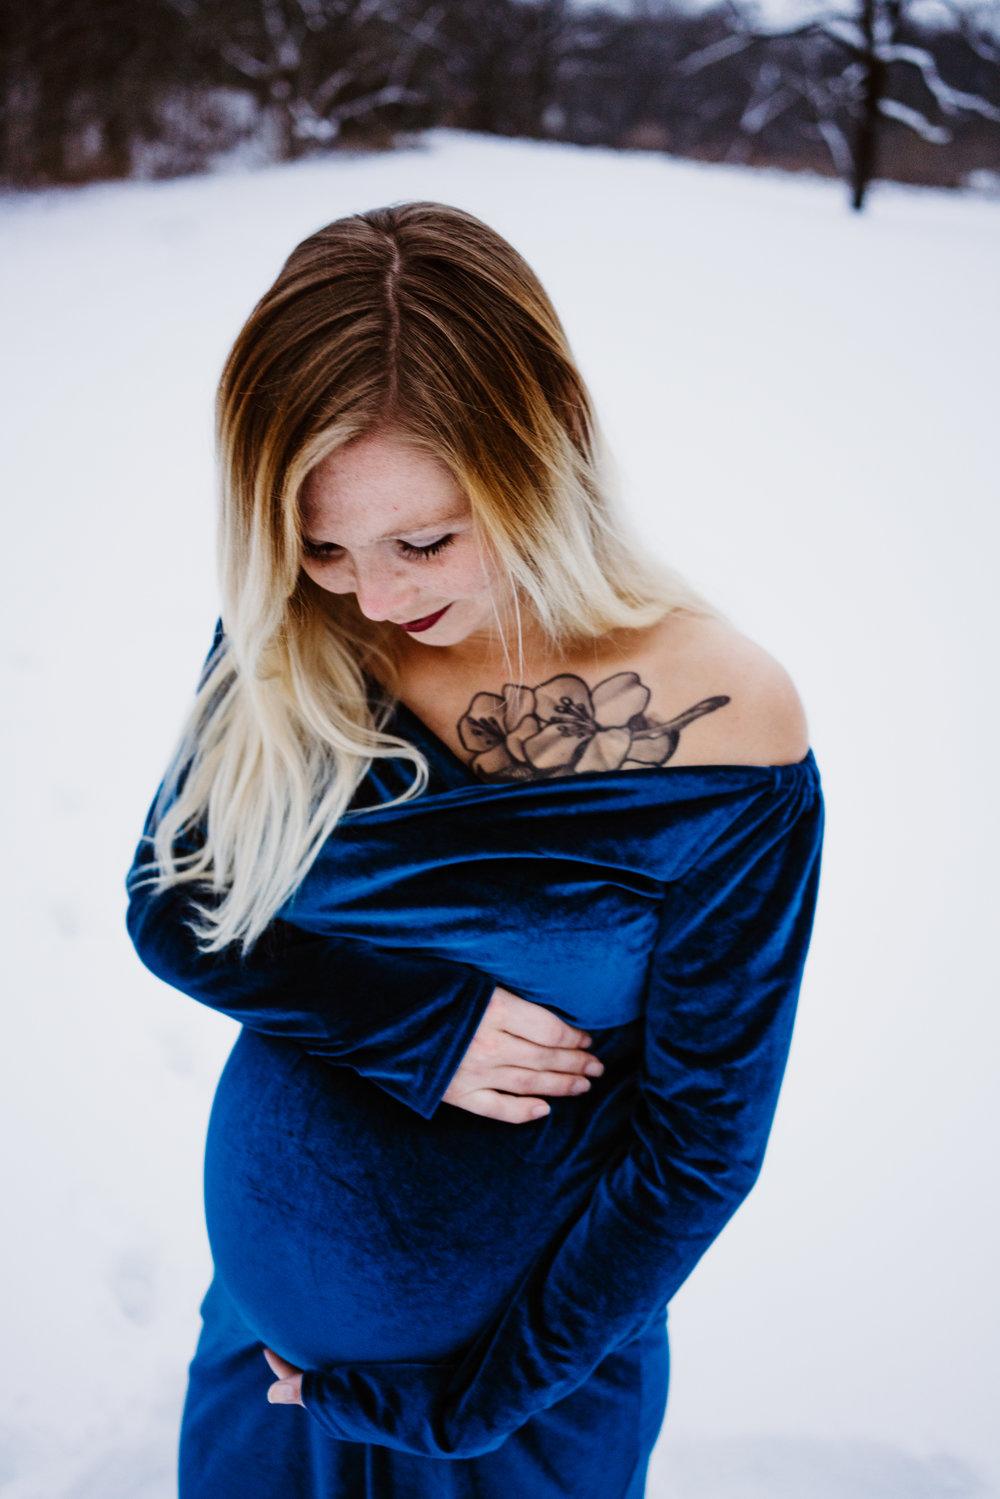 BCannon-Mandy#3-4.jpeg